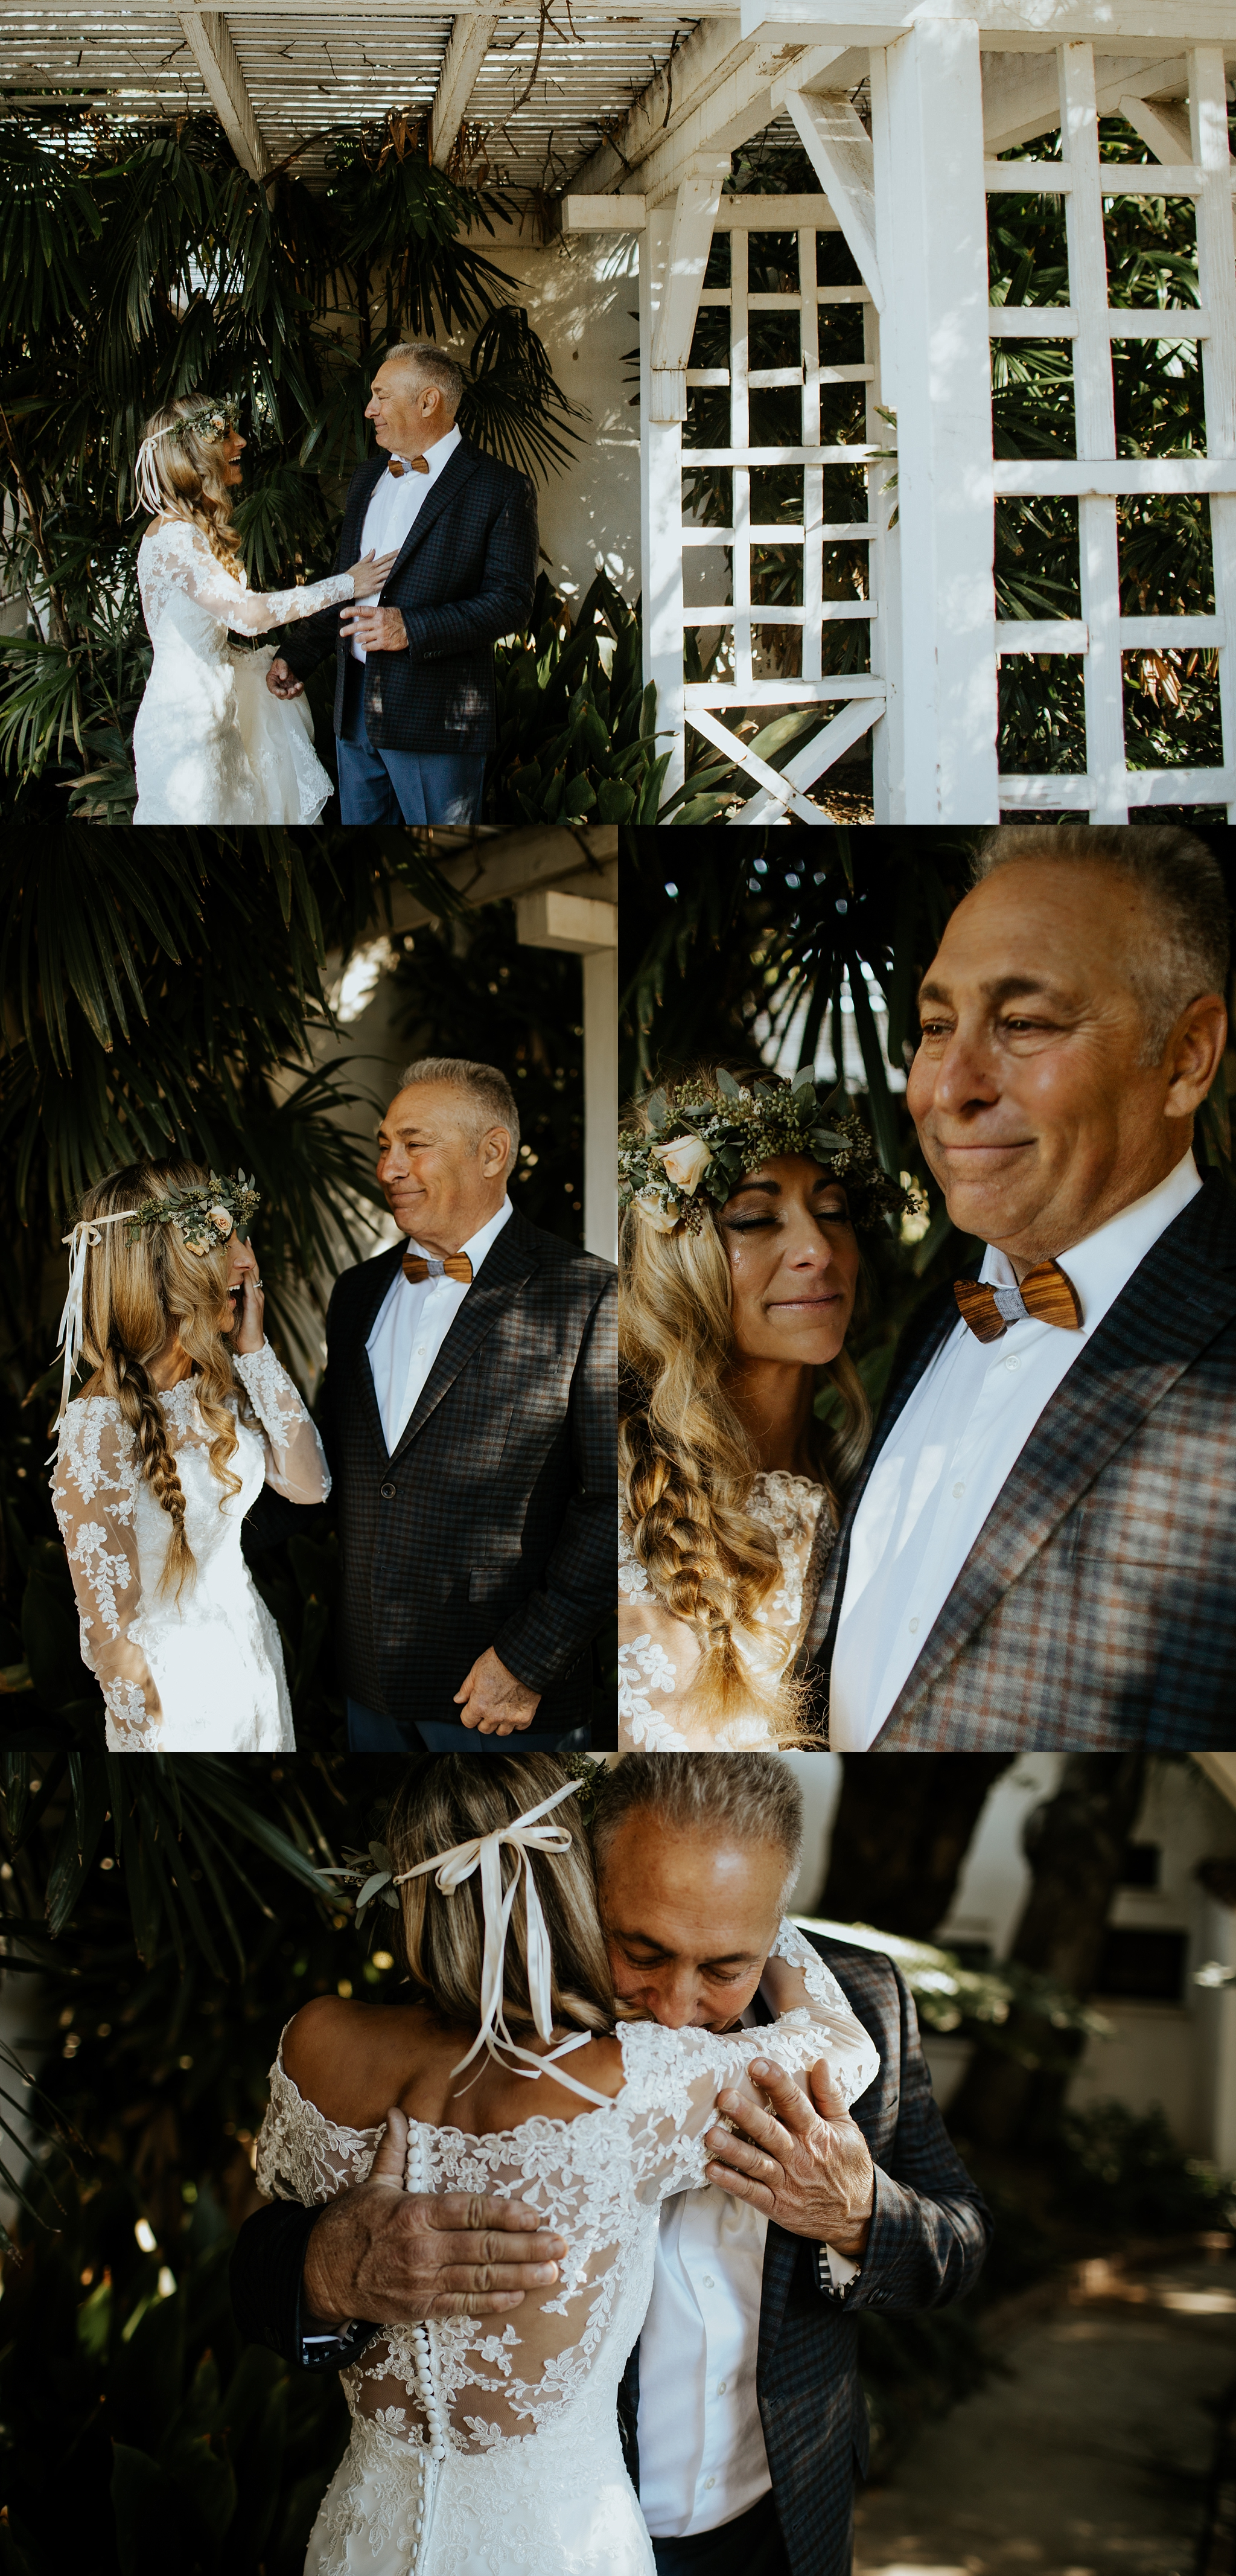 Bohemian Orcutt Ranch Wedding in Los Angeles California  - Los Angeles Californai Wedding Photographer_0018.jpg